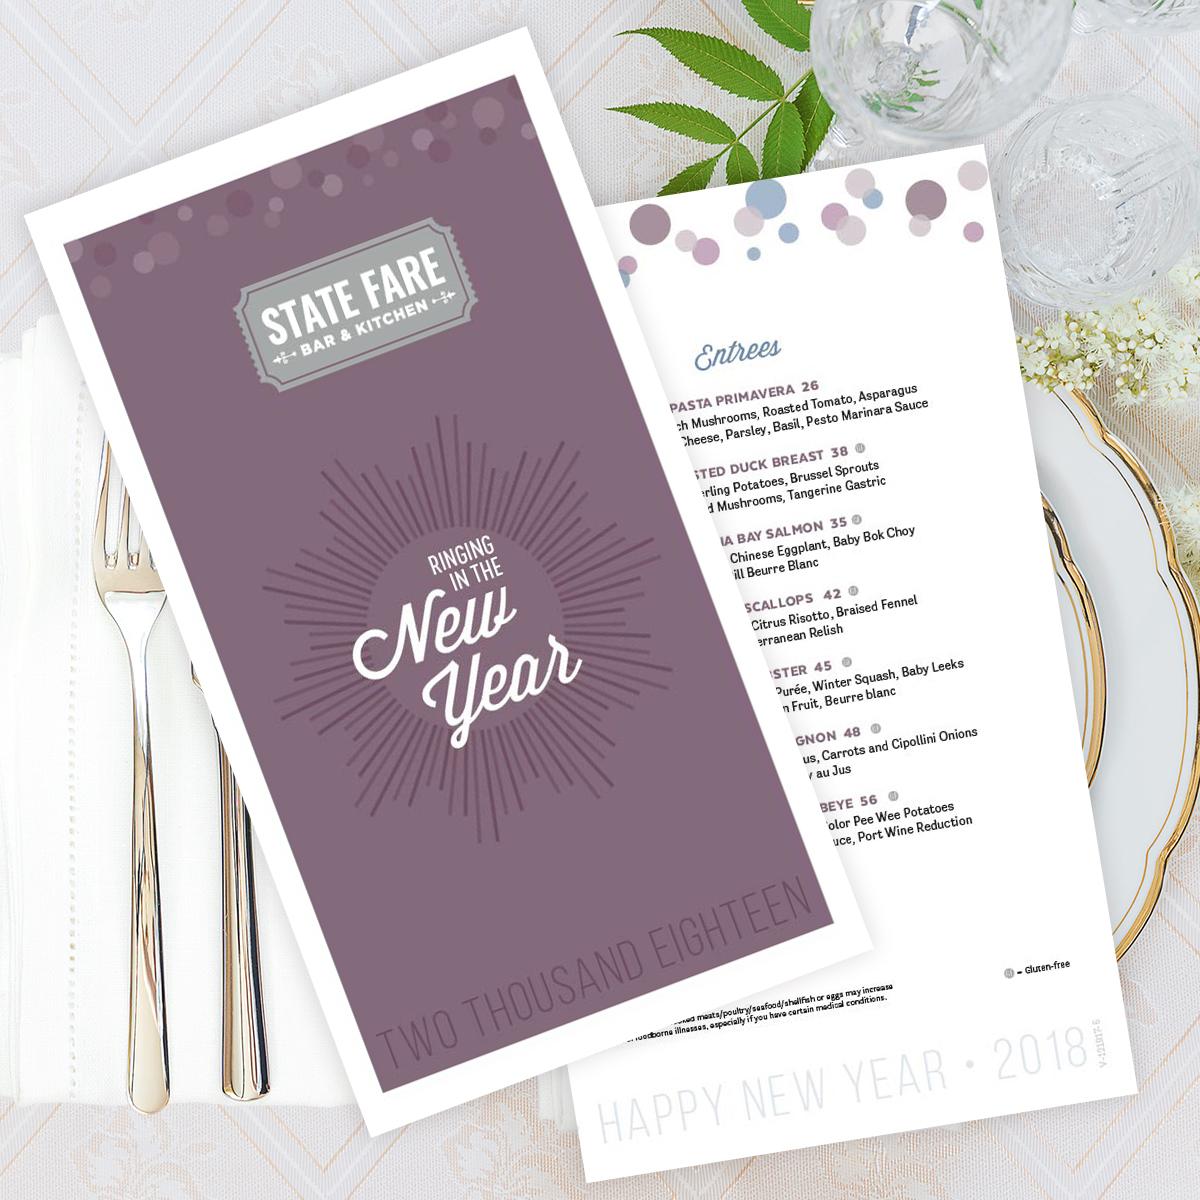 2017 New Year's Eve Menu Design